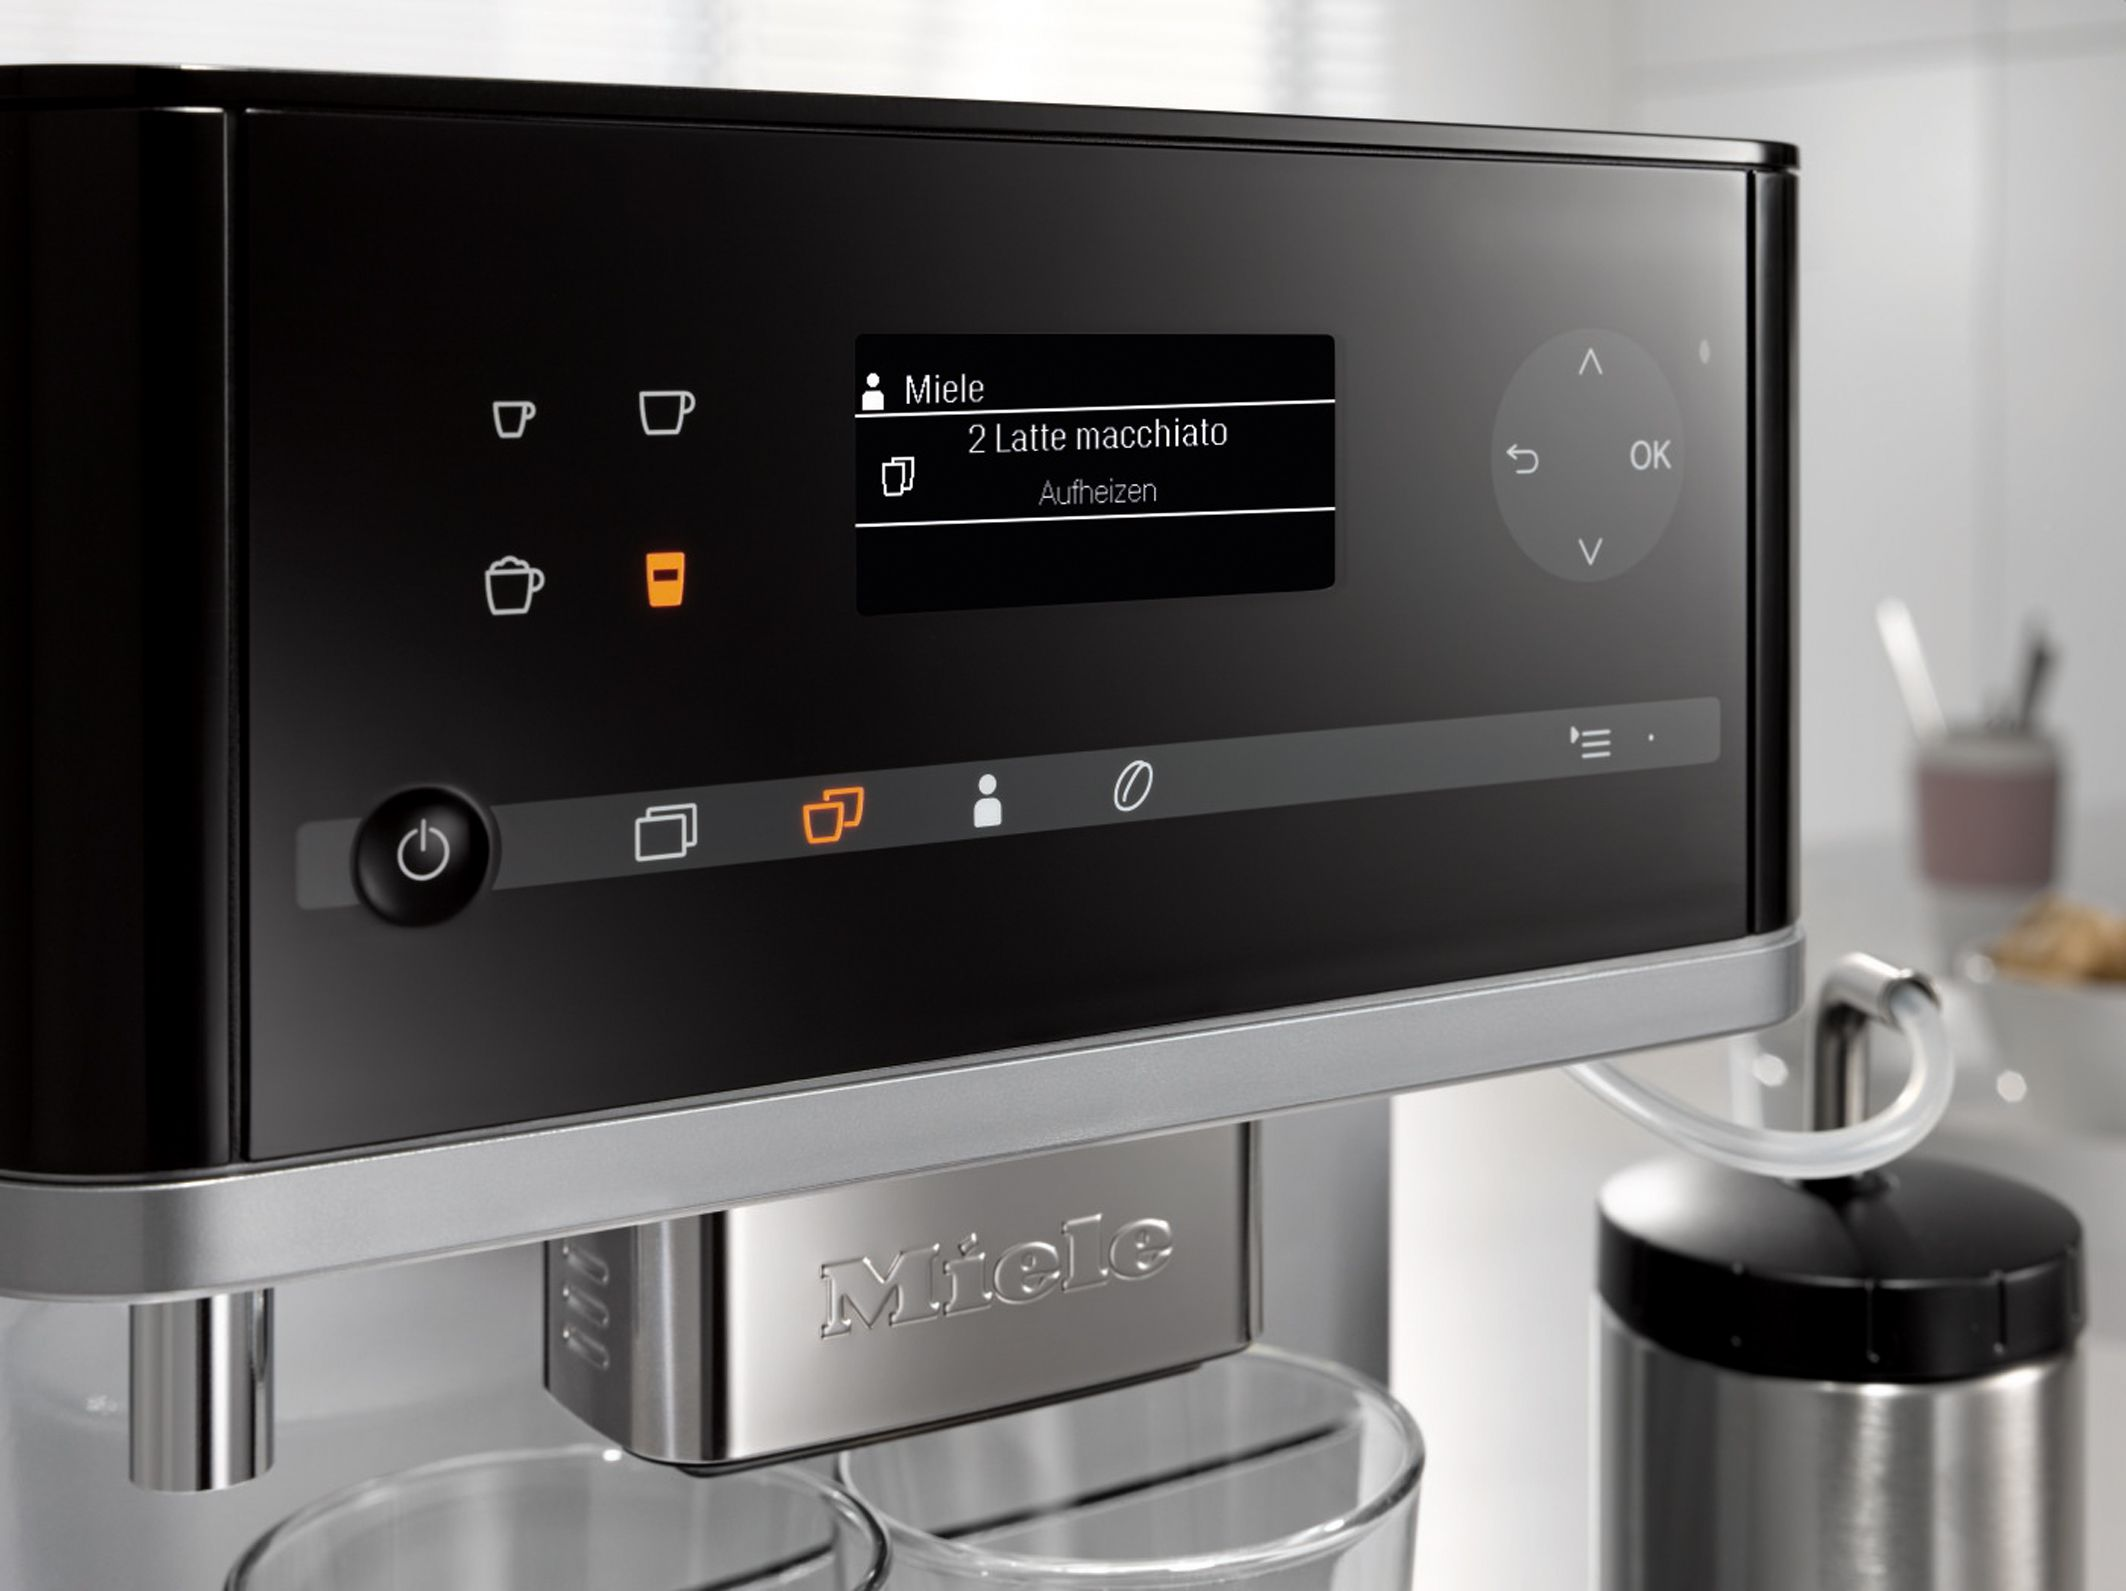 miele kaffeevollautomat cm6300 display miele kaffeevollautomat cm6100 und miele. Black Bedroom Furniture Sets. Home Design Ideas